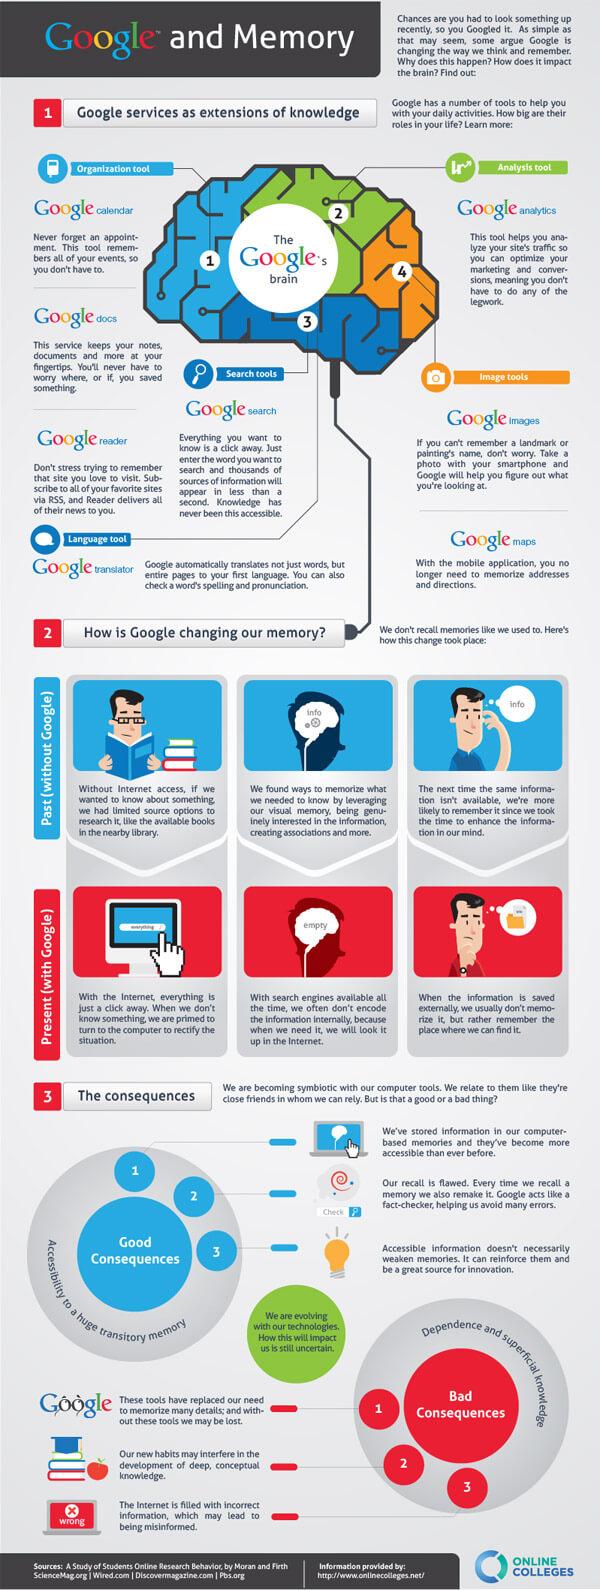 google-memory-infographic